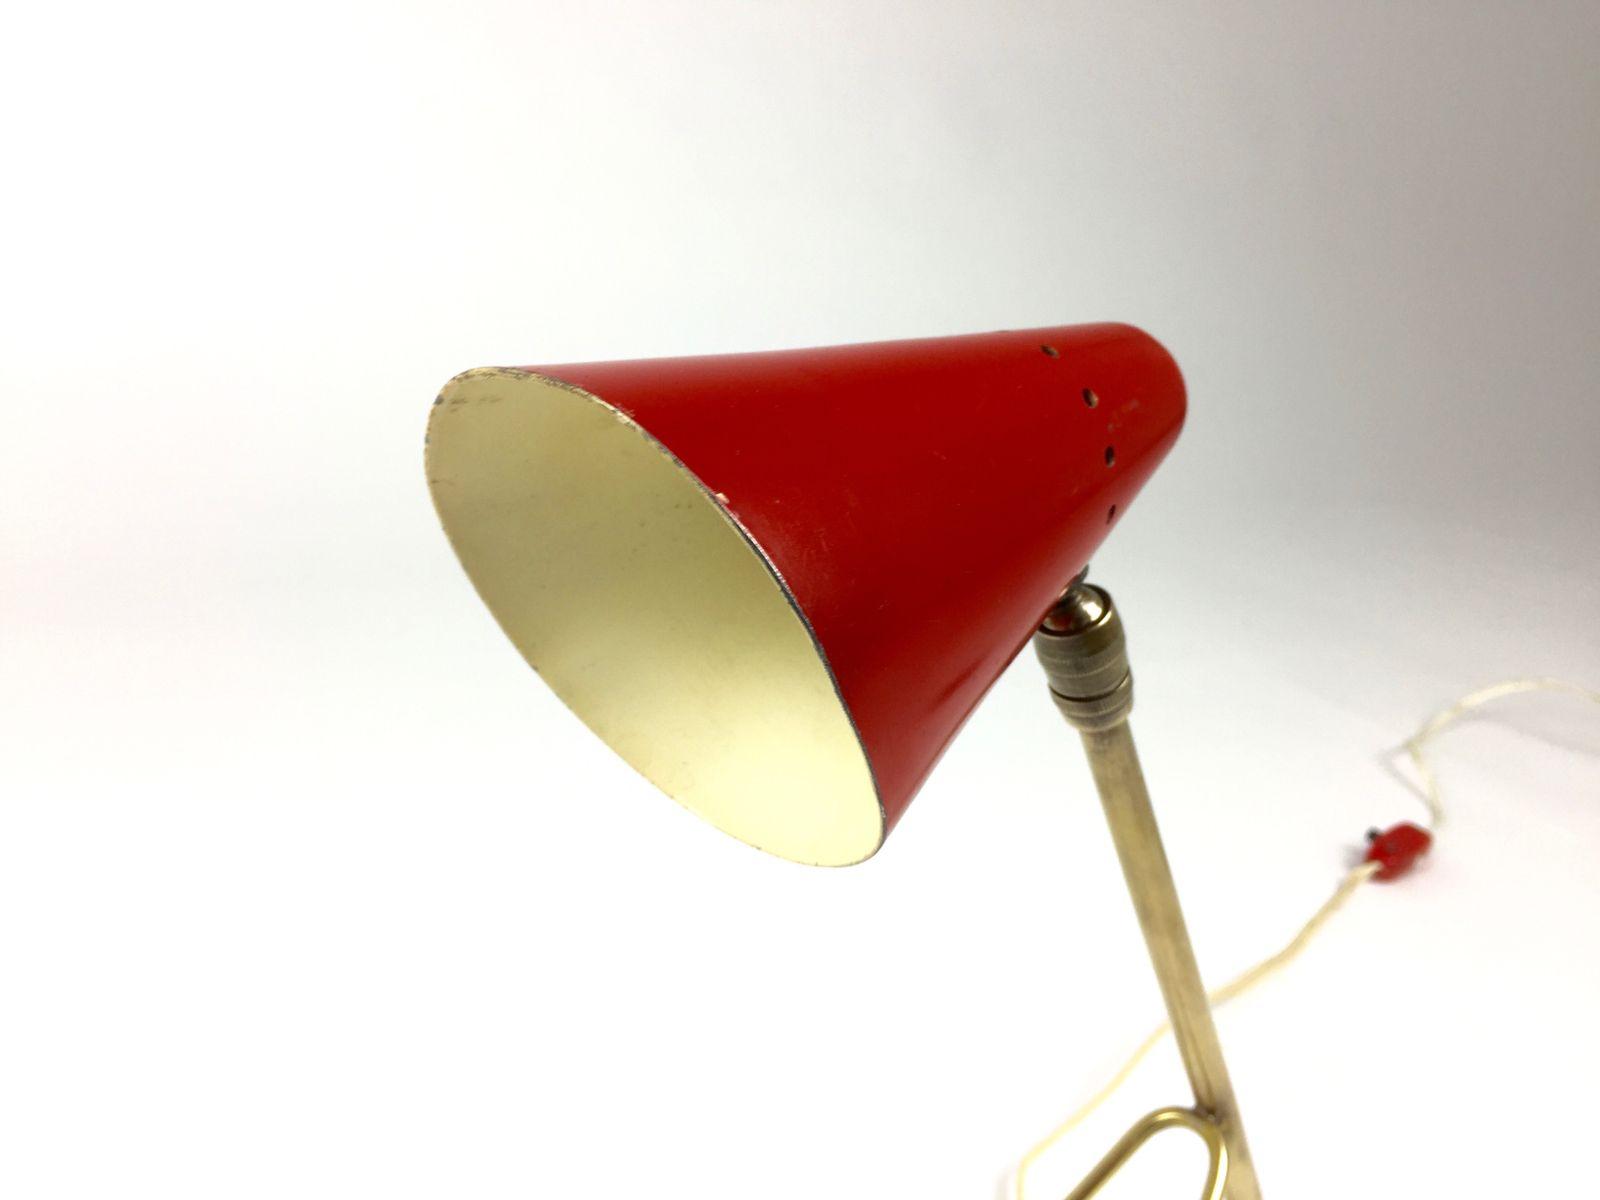 franz sische cocotte lampe von jean boris lacroix 1950er bei pamono kaufen. Black Bedroom Furniture Sets. Home Design Ideas